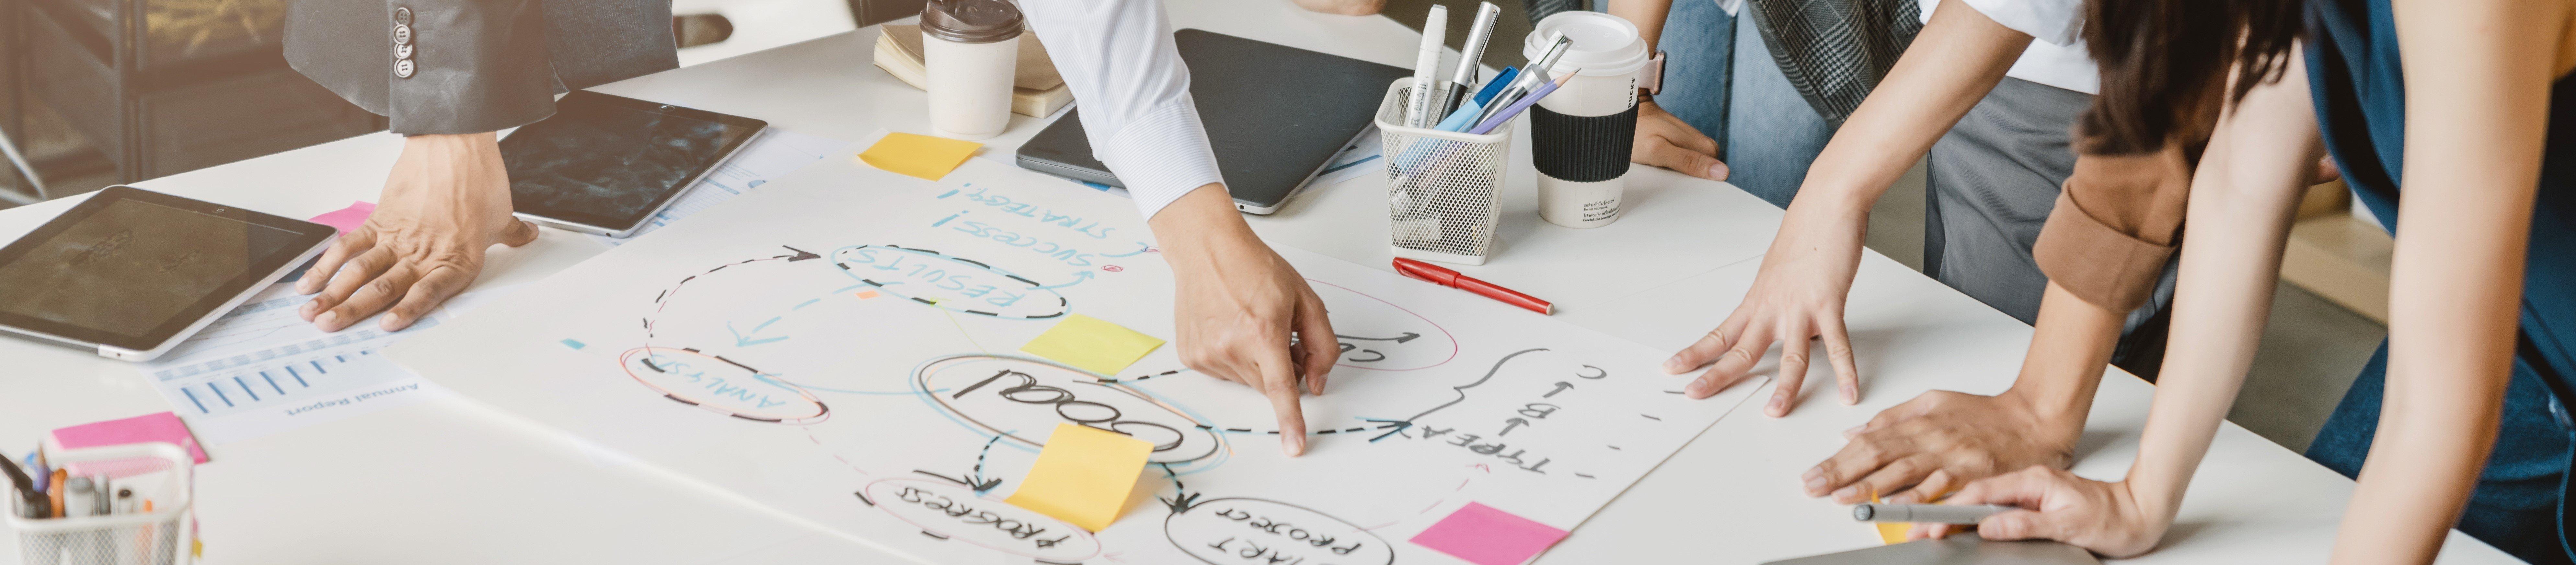 projectplanning CRM